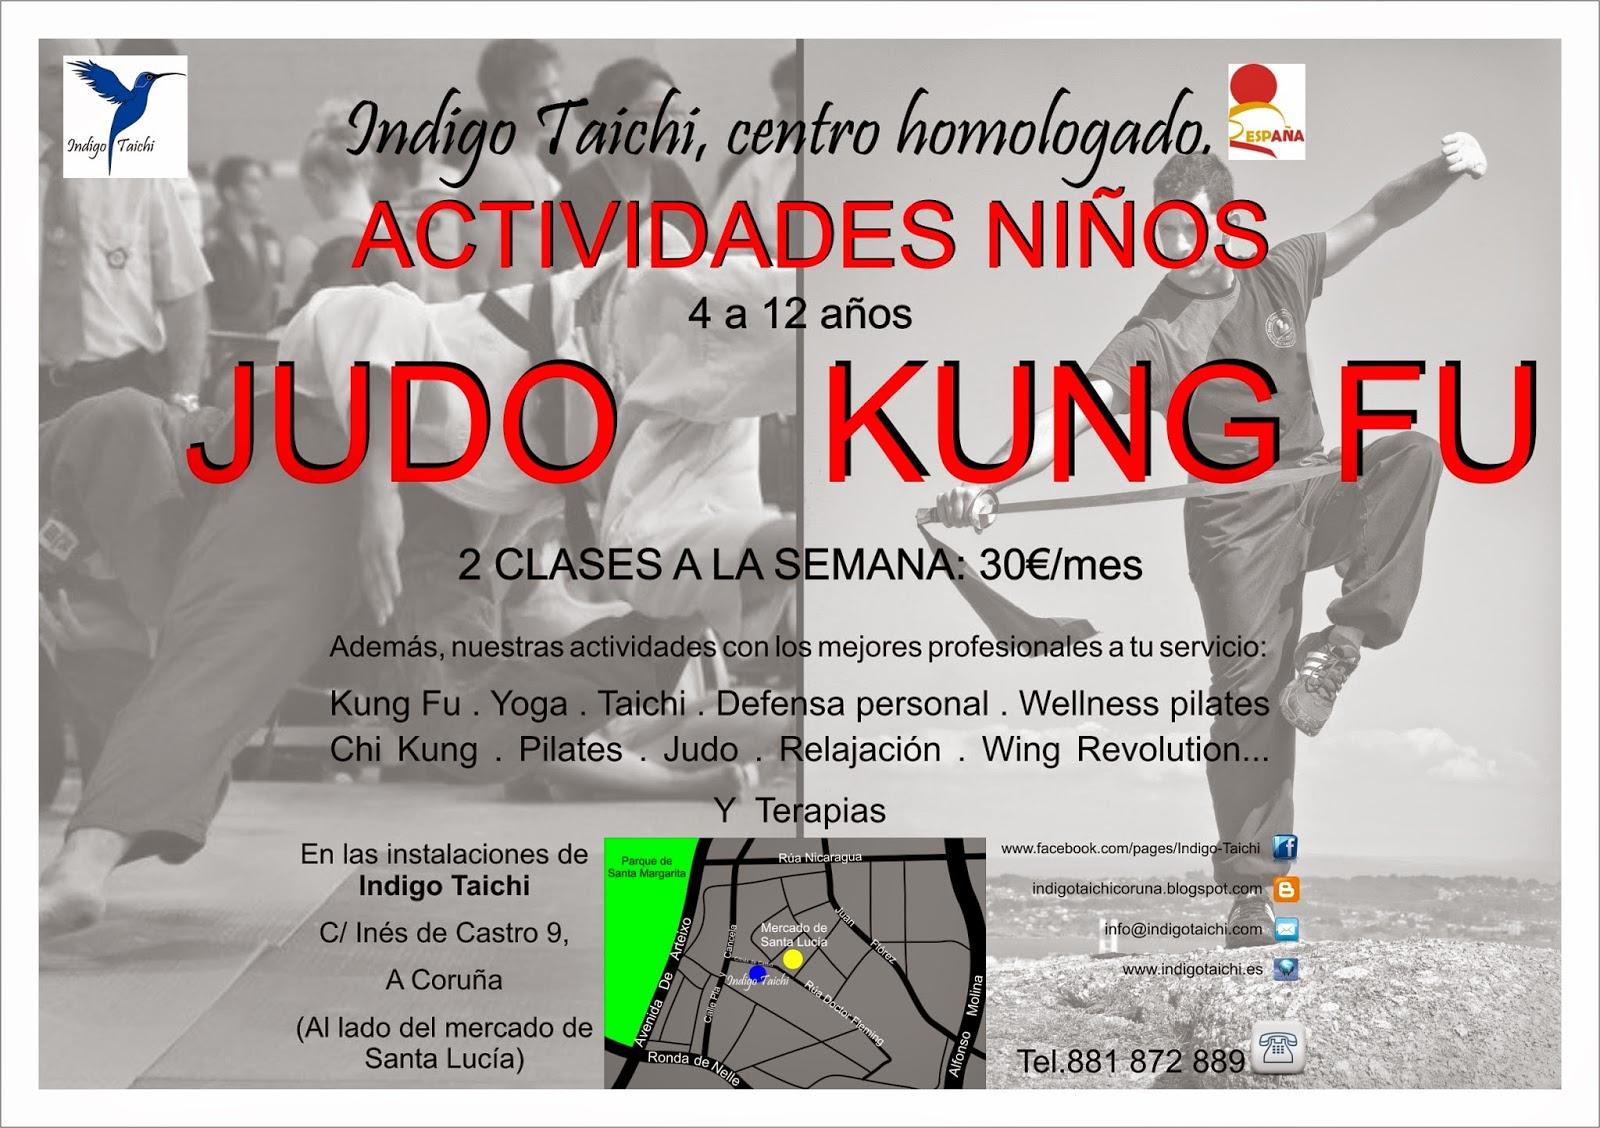 Judo/kung fu